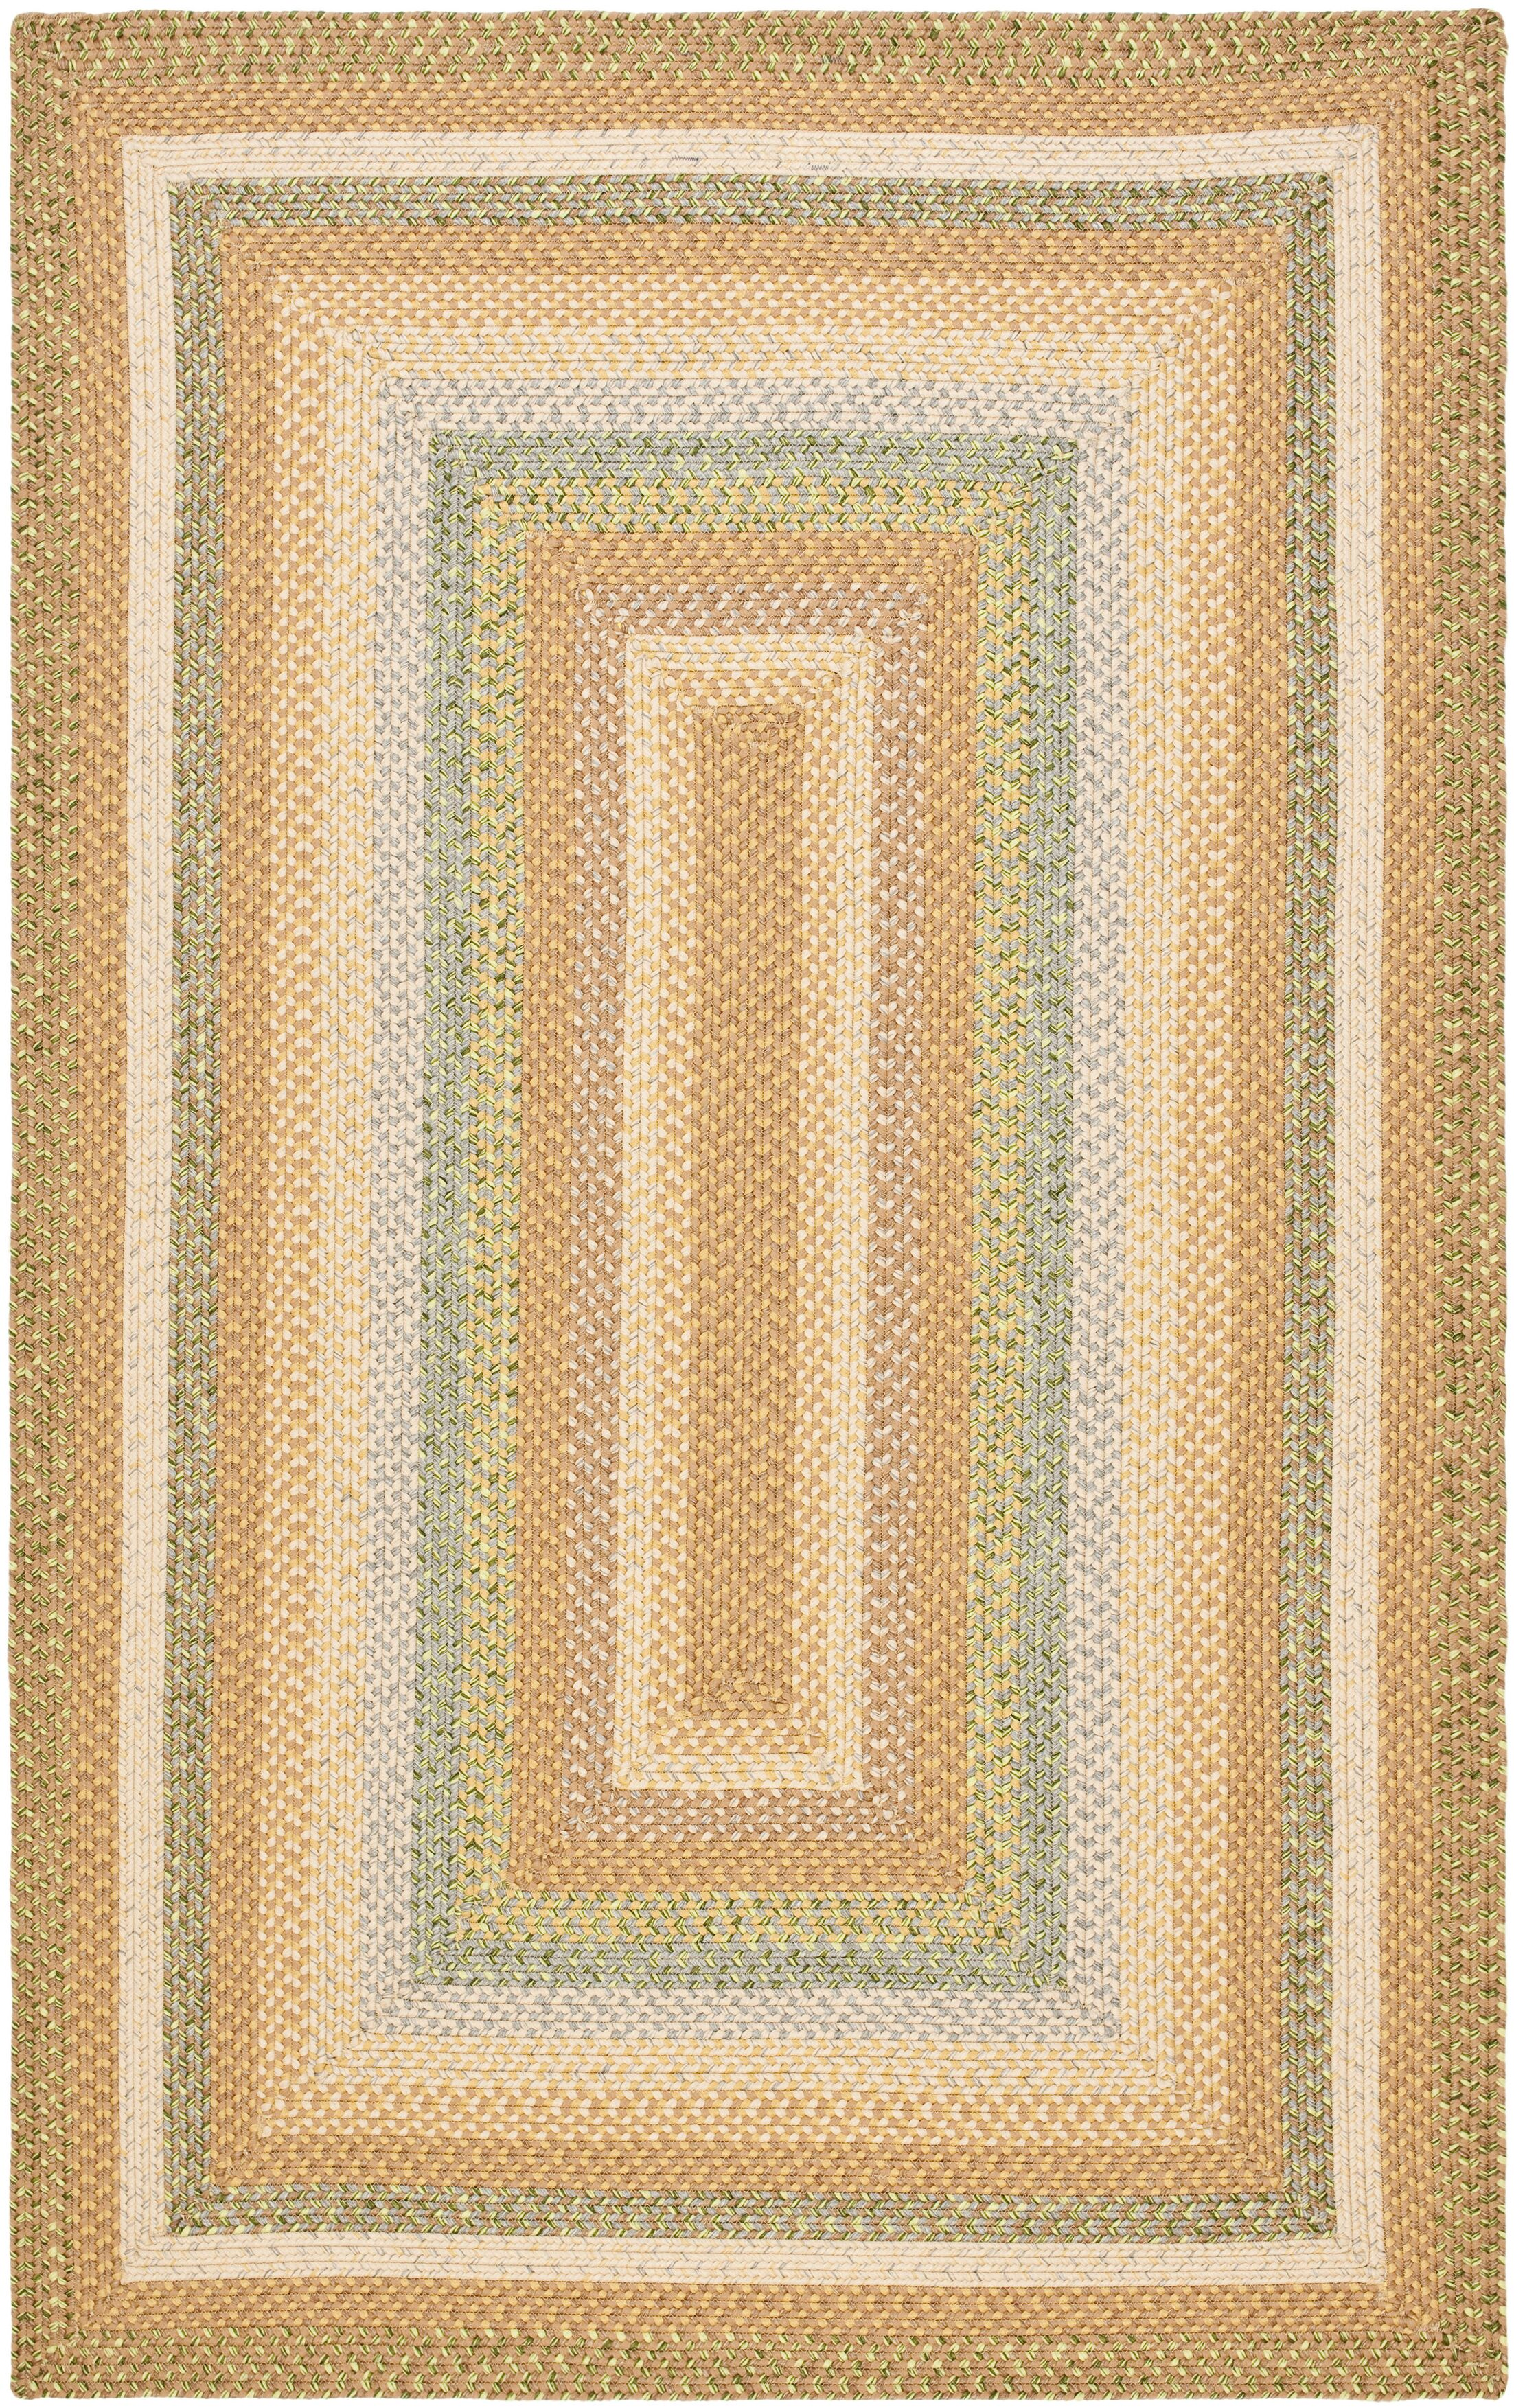 Georgina Tan/Multi Area Rug Rug Size: Rectangle 4' x 6'